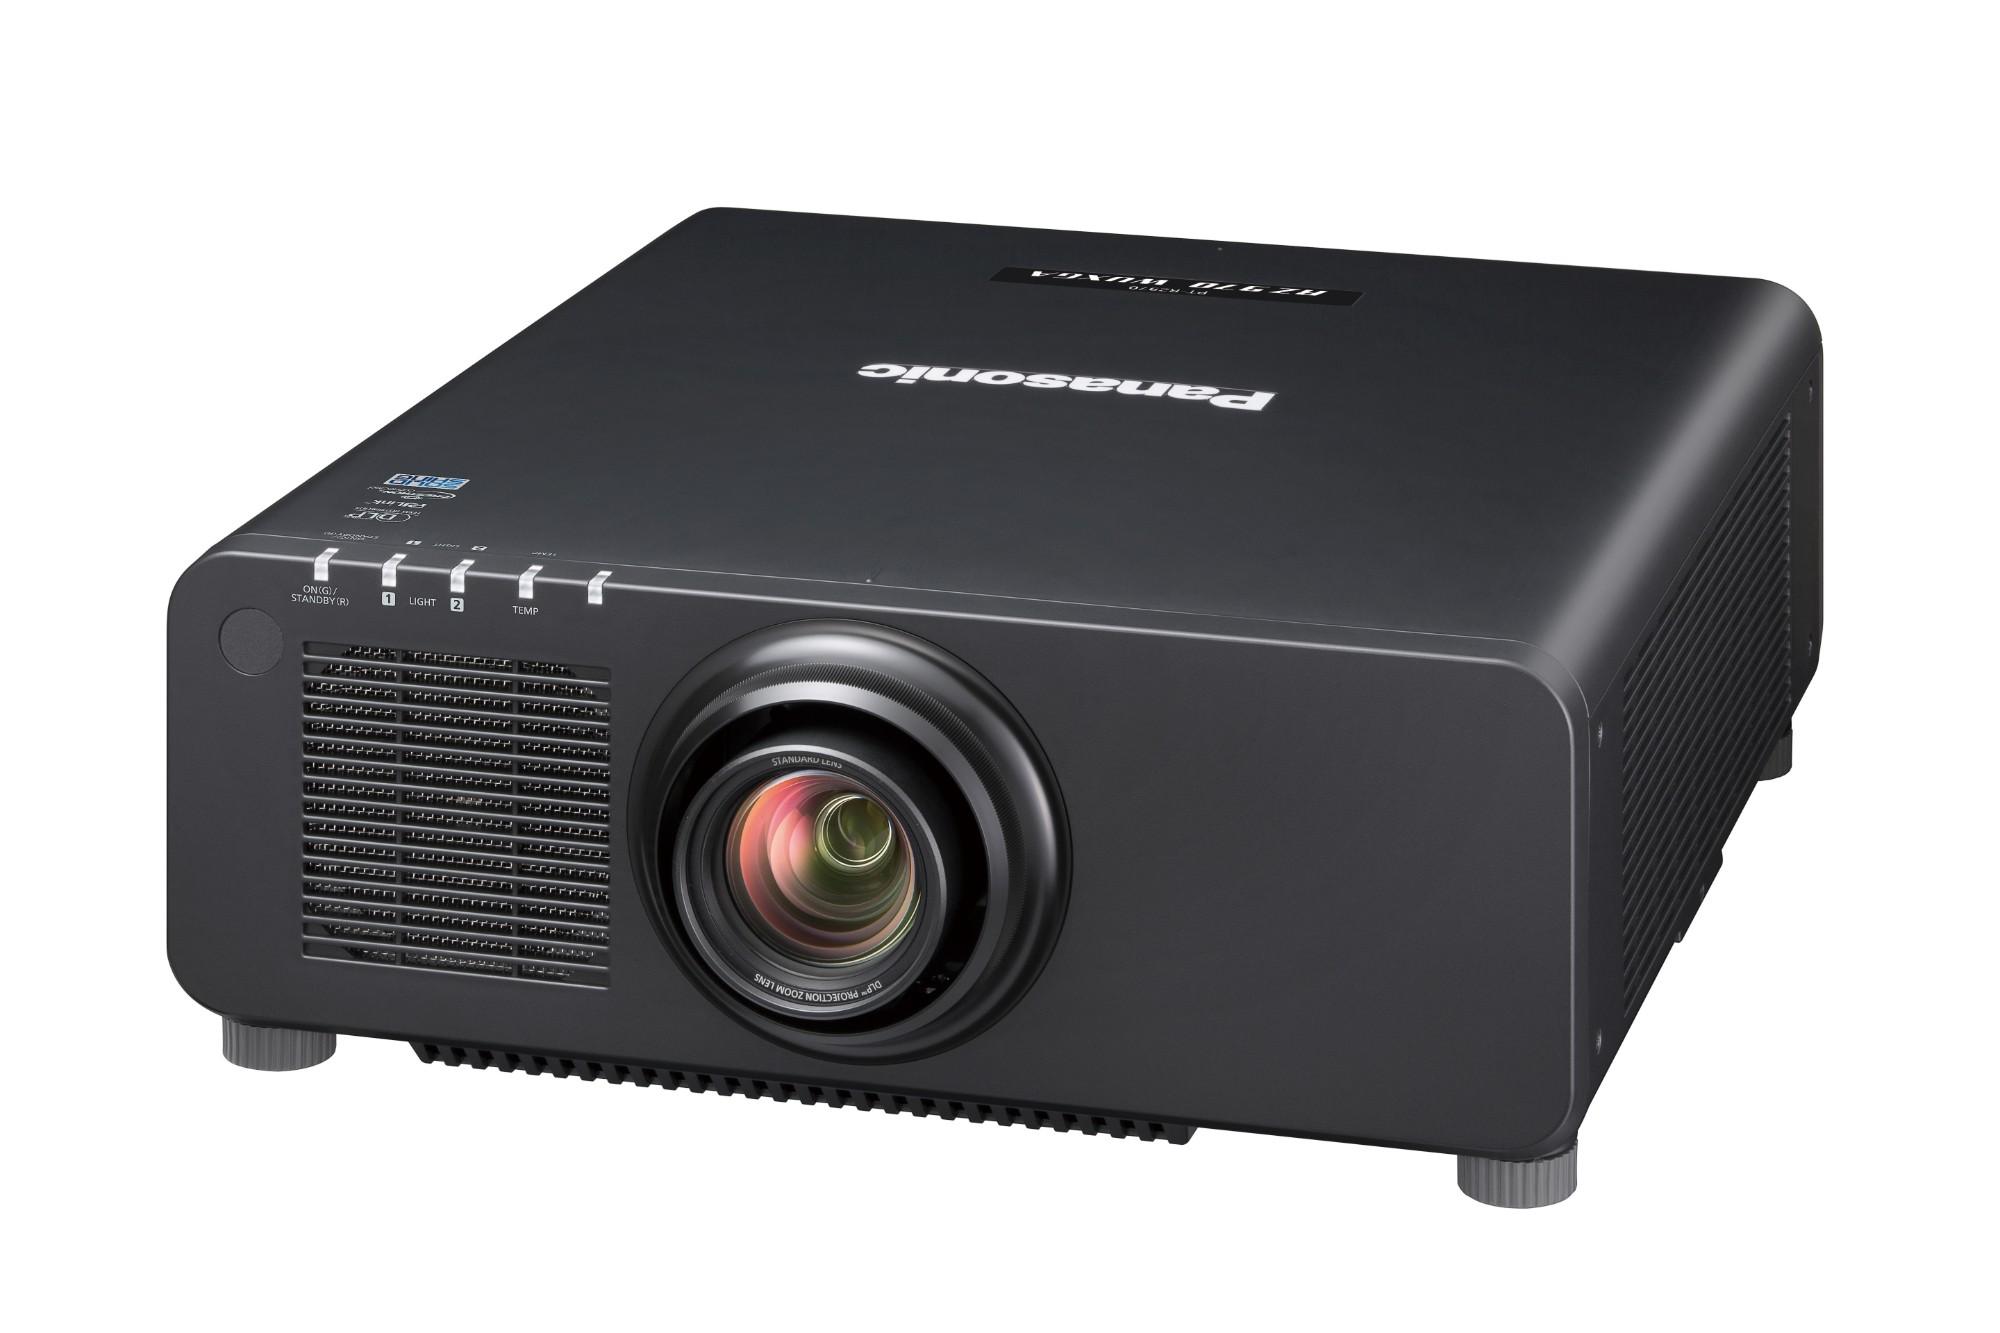 Panasonic PT-RZ970 9400ANSI lumens DLP WUXGA (1920x1200) Desktop projector Black